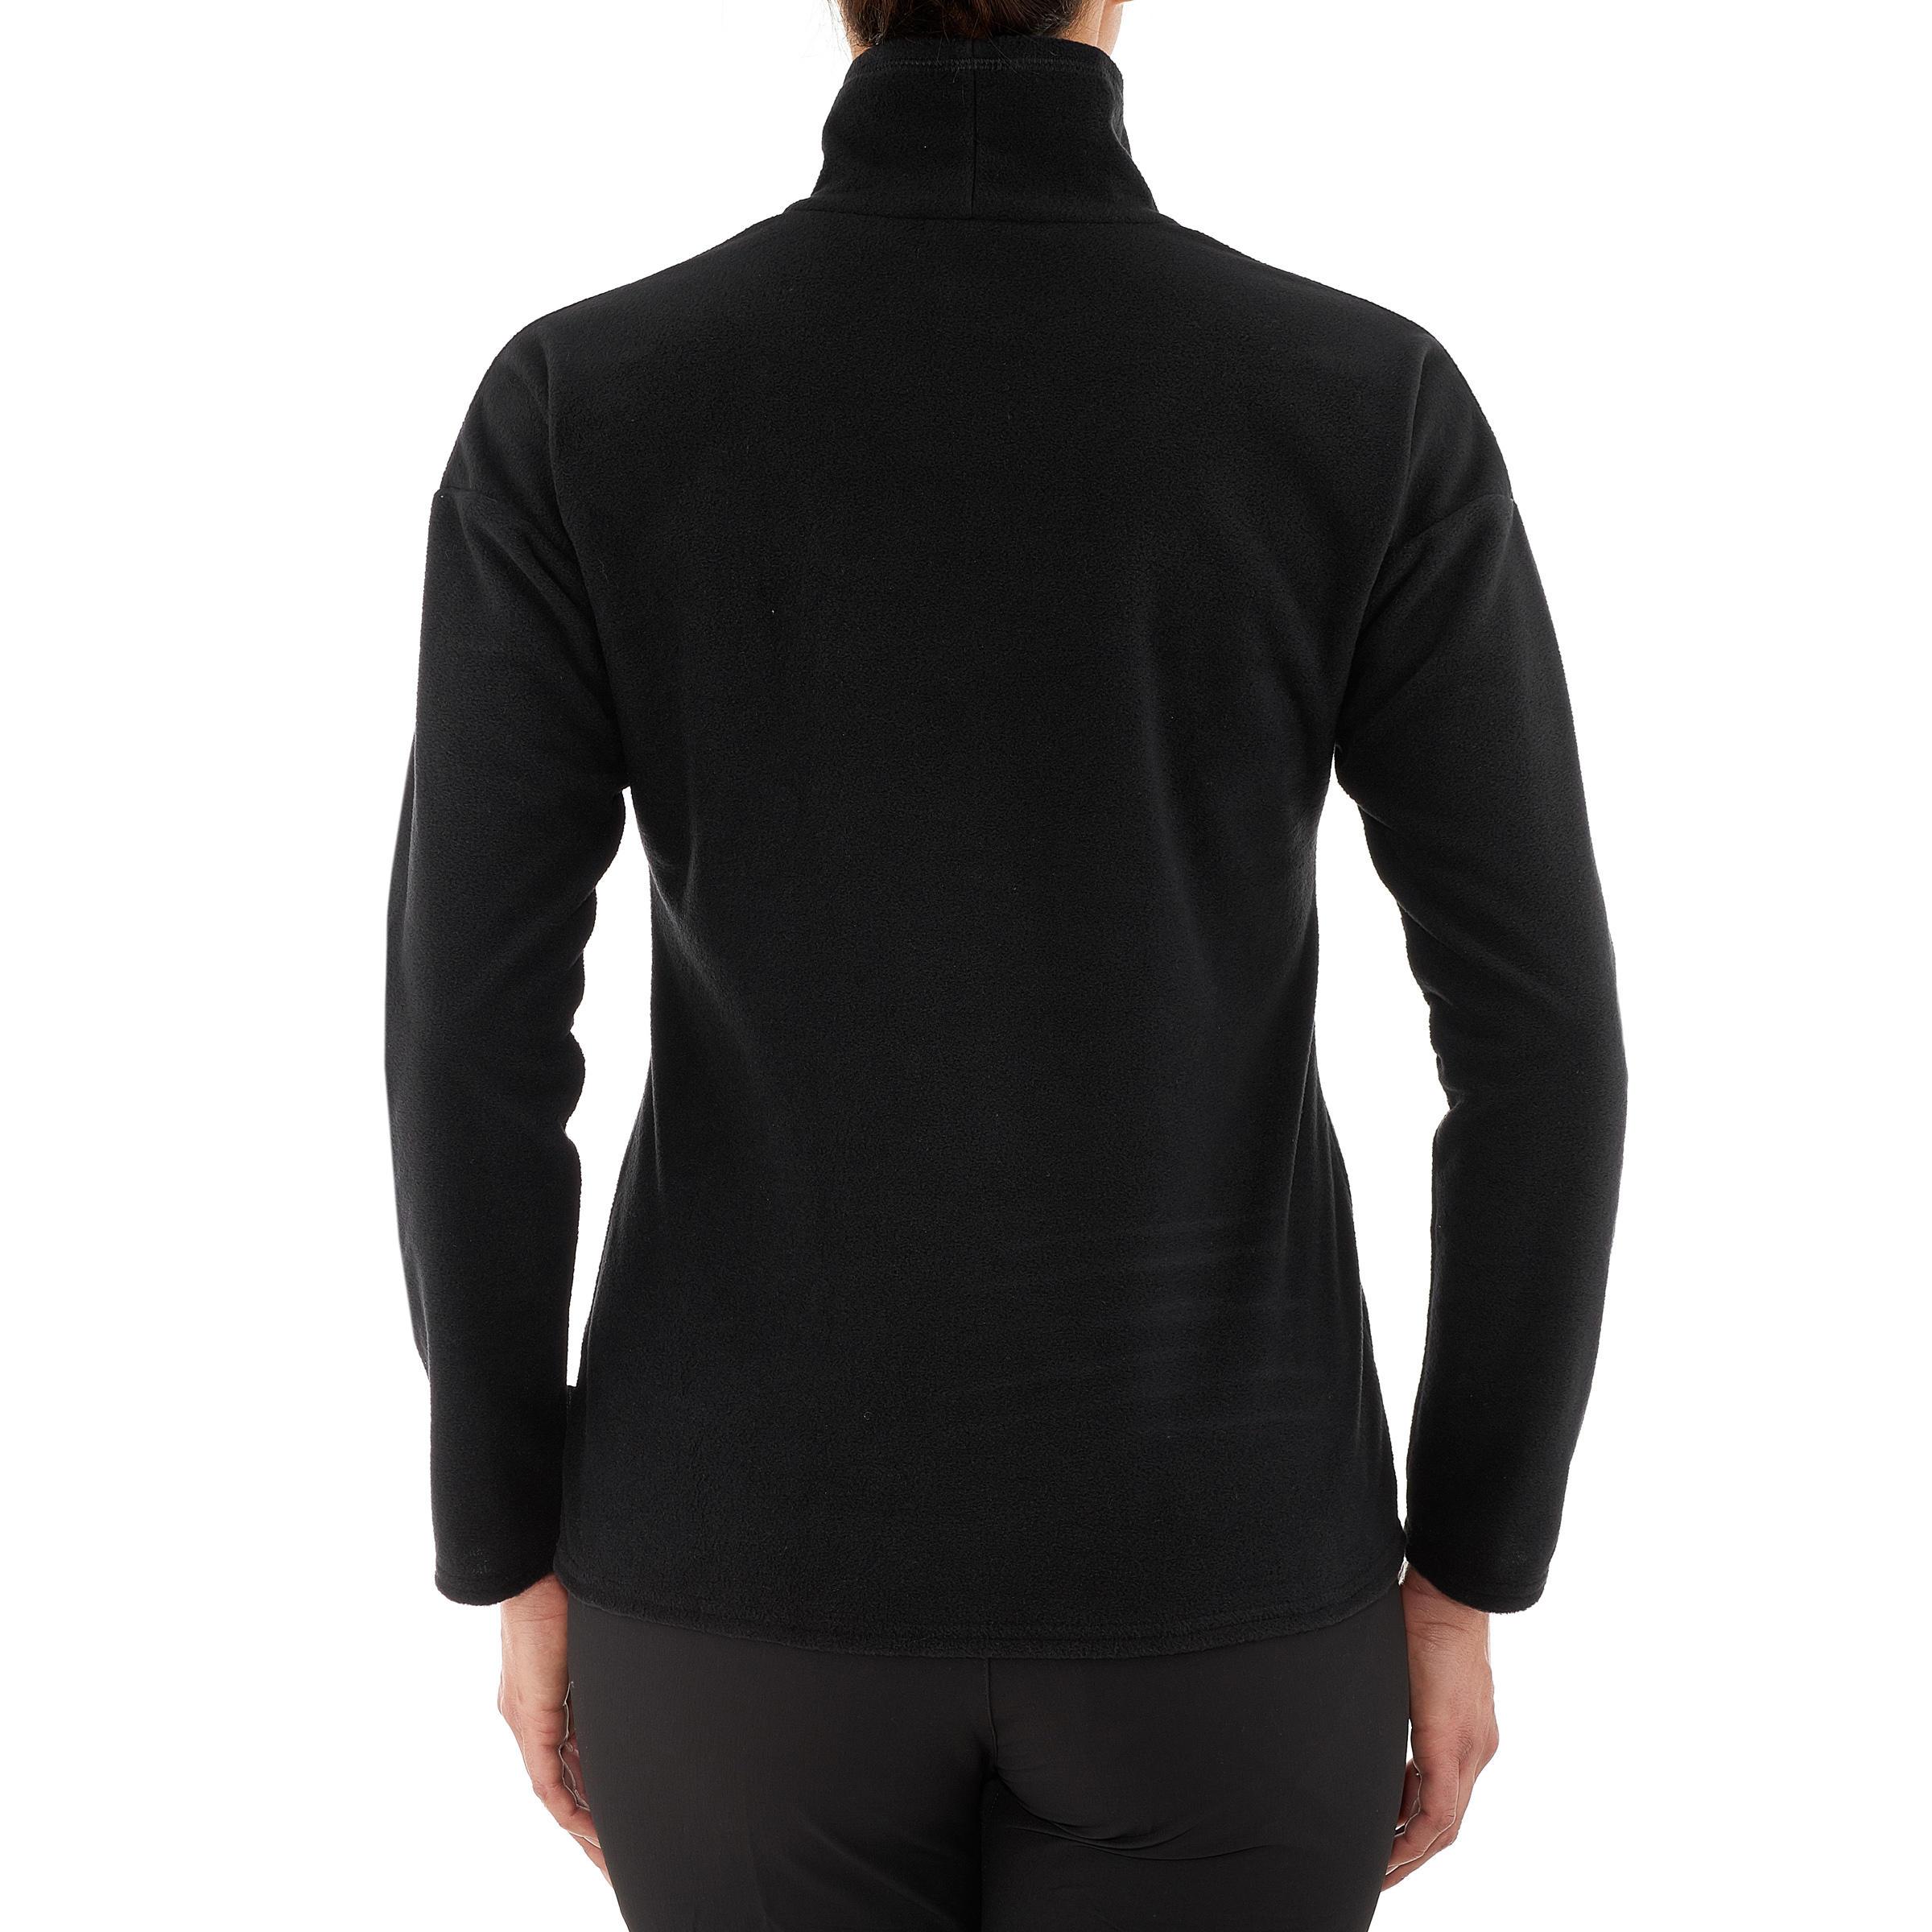 Women's MH20 Black Mountain Hiking Fleece Sweater